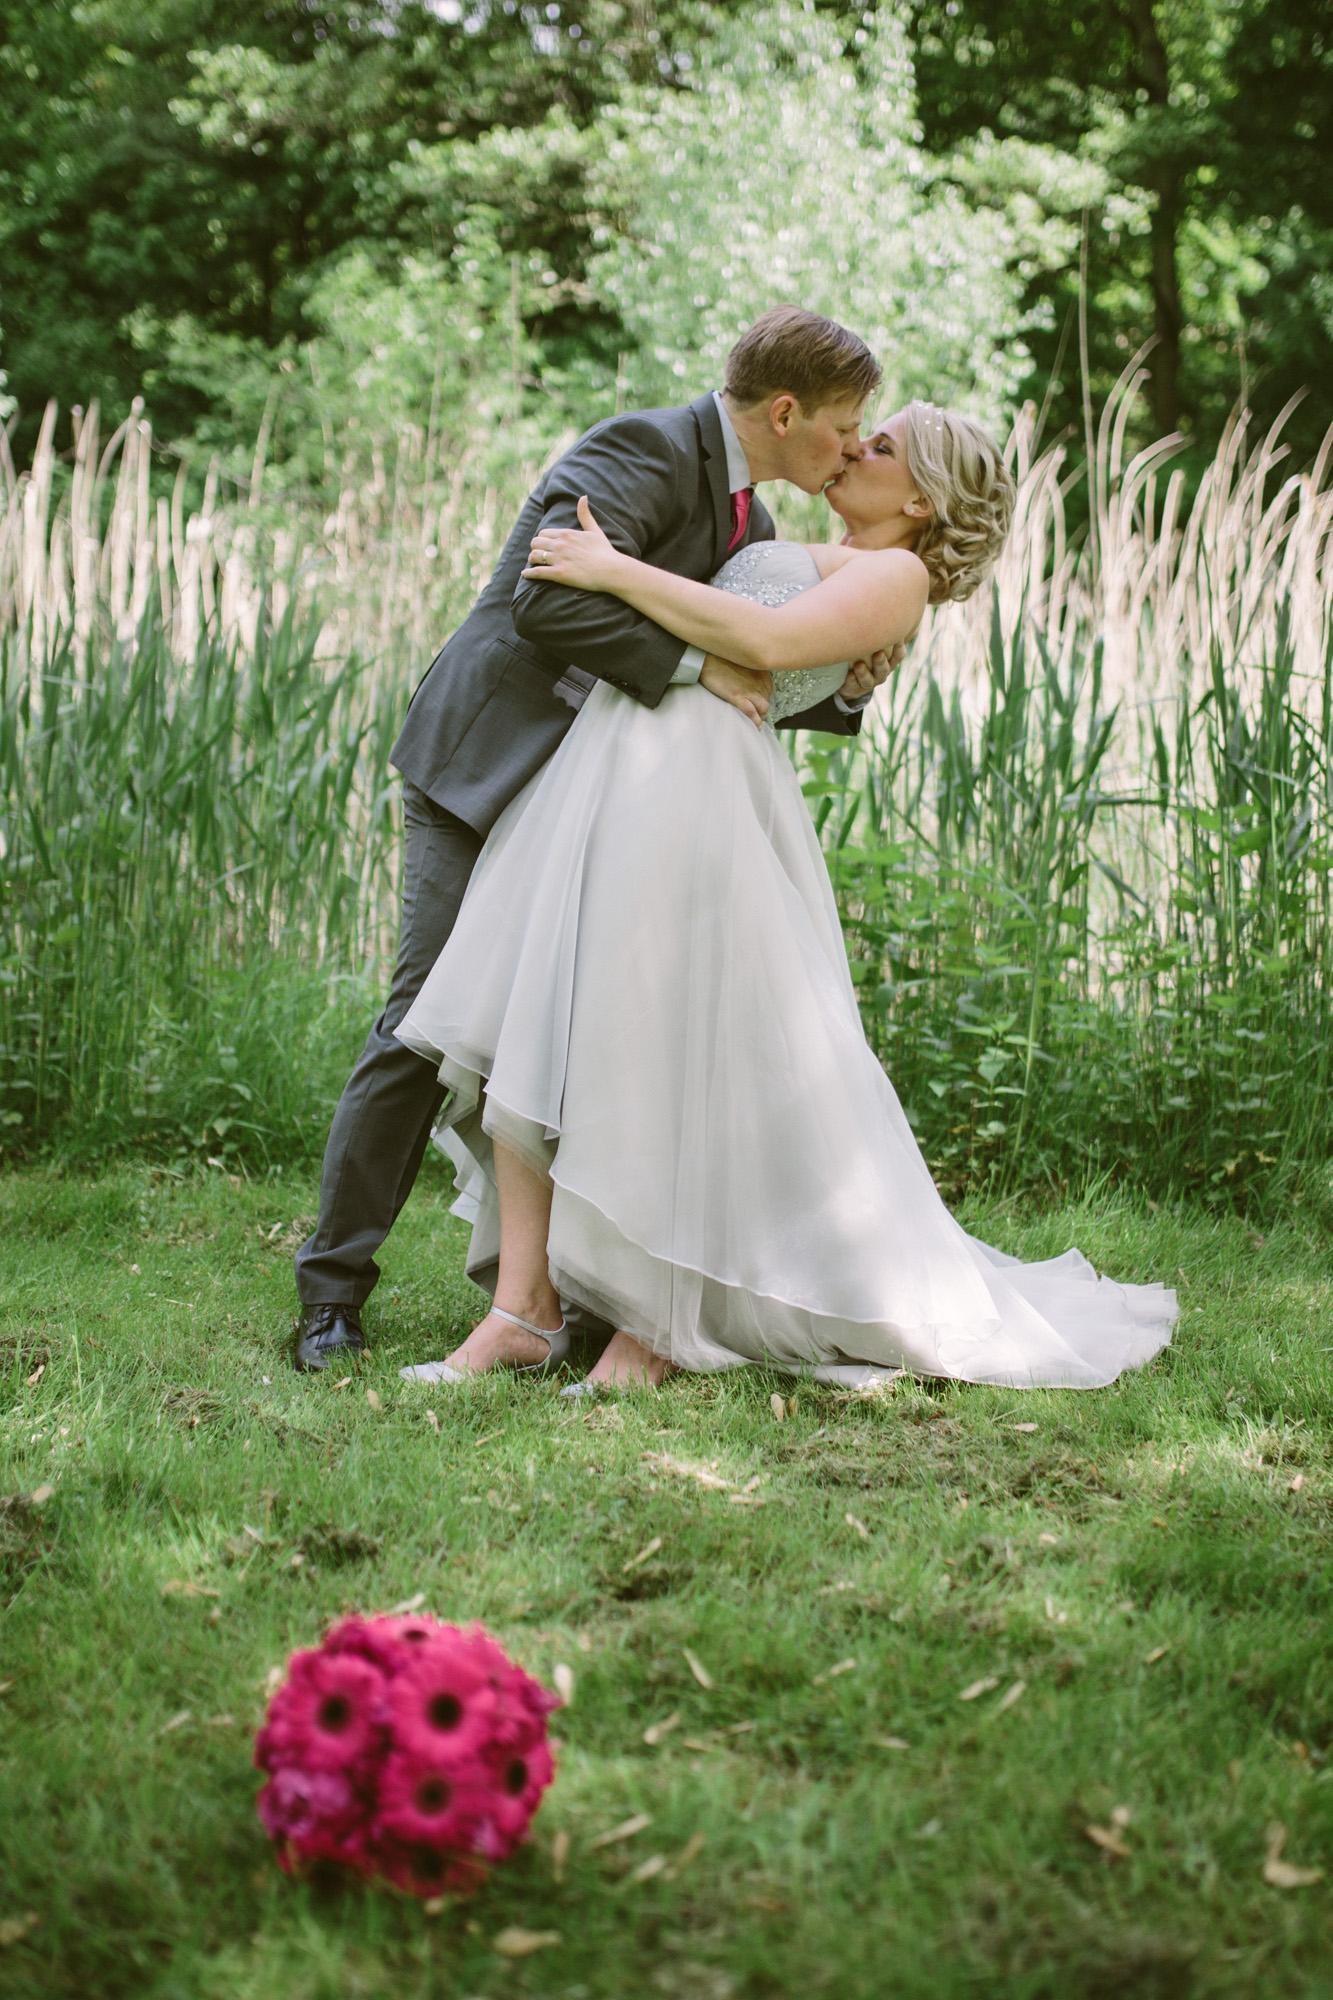 Claudia-Krawinkel-Hochzeitsfotografie-Essen-Duisburg-Standesamt-Schloss-Borbeck-34